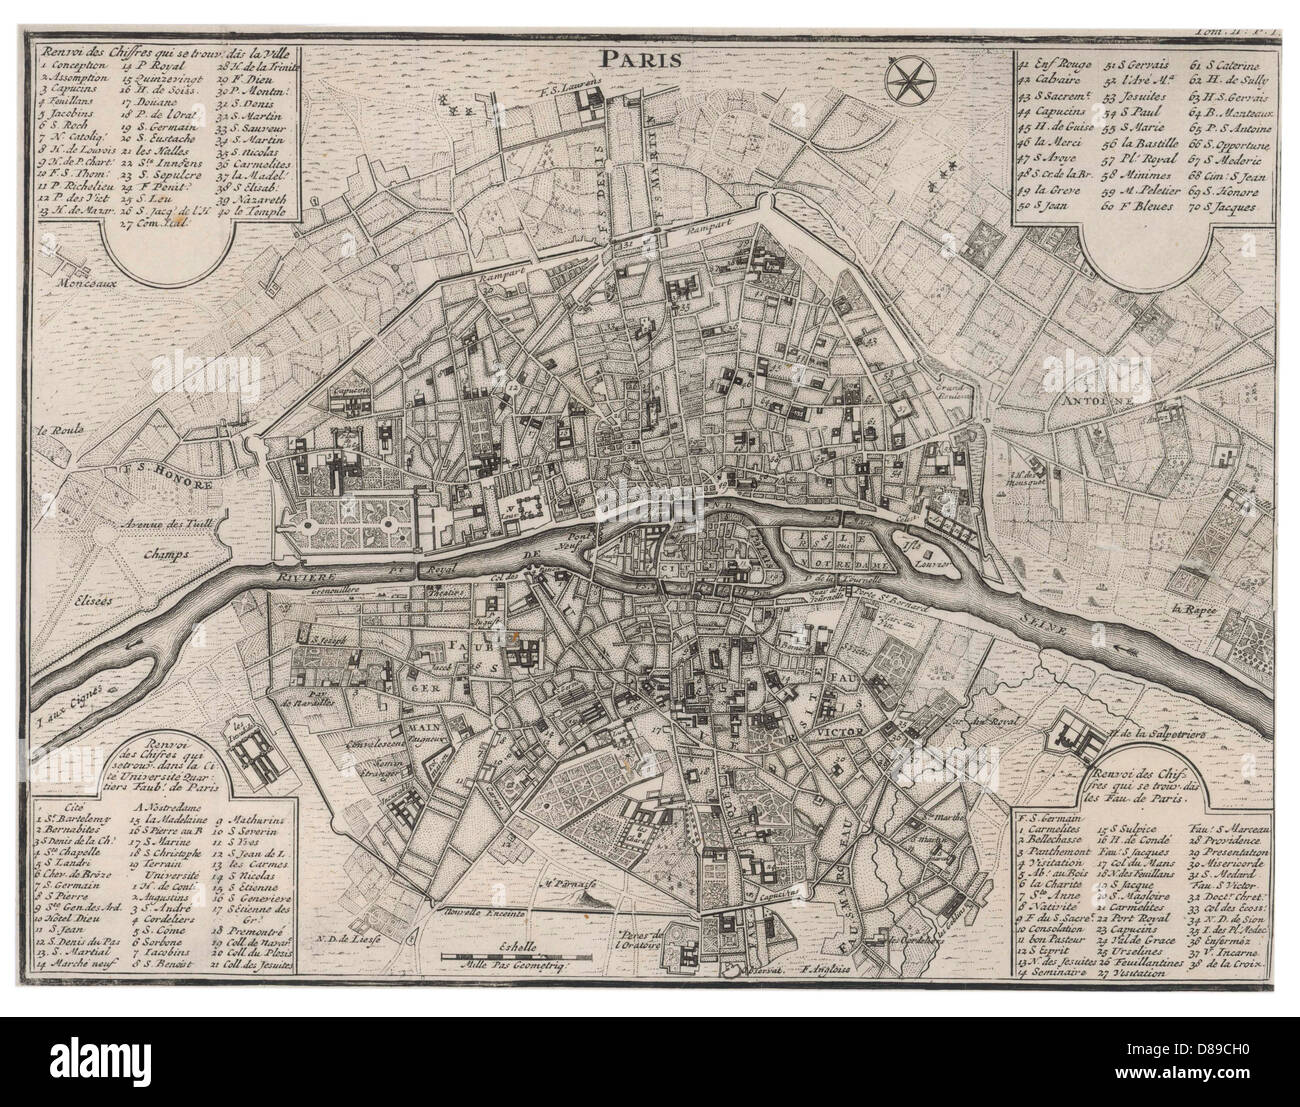 Map Paris C Stock Photo Alamy - Map of paris bastille